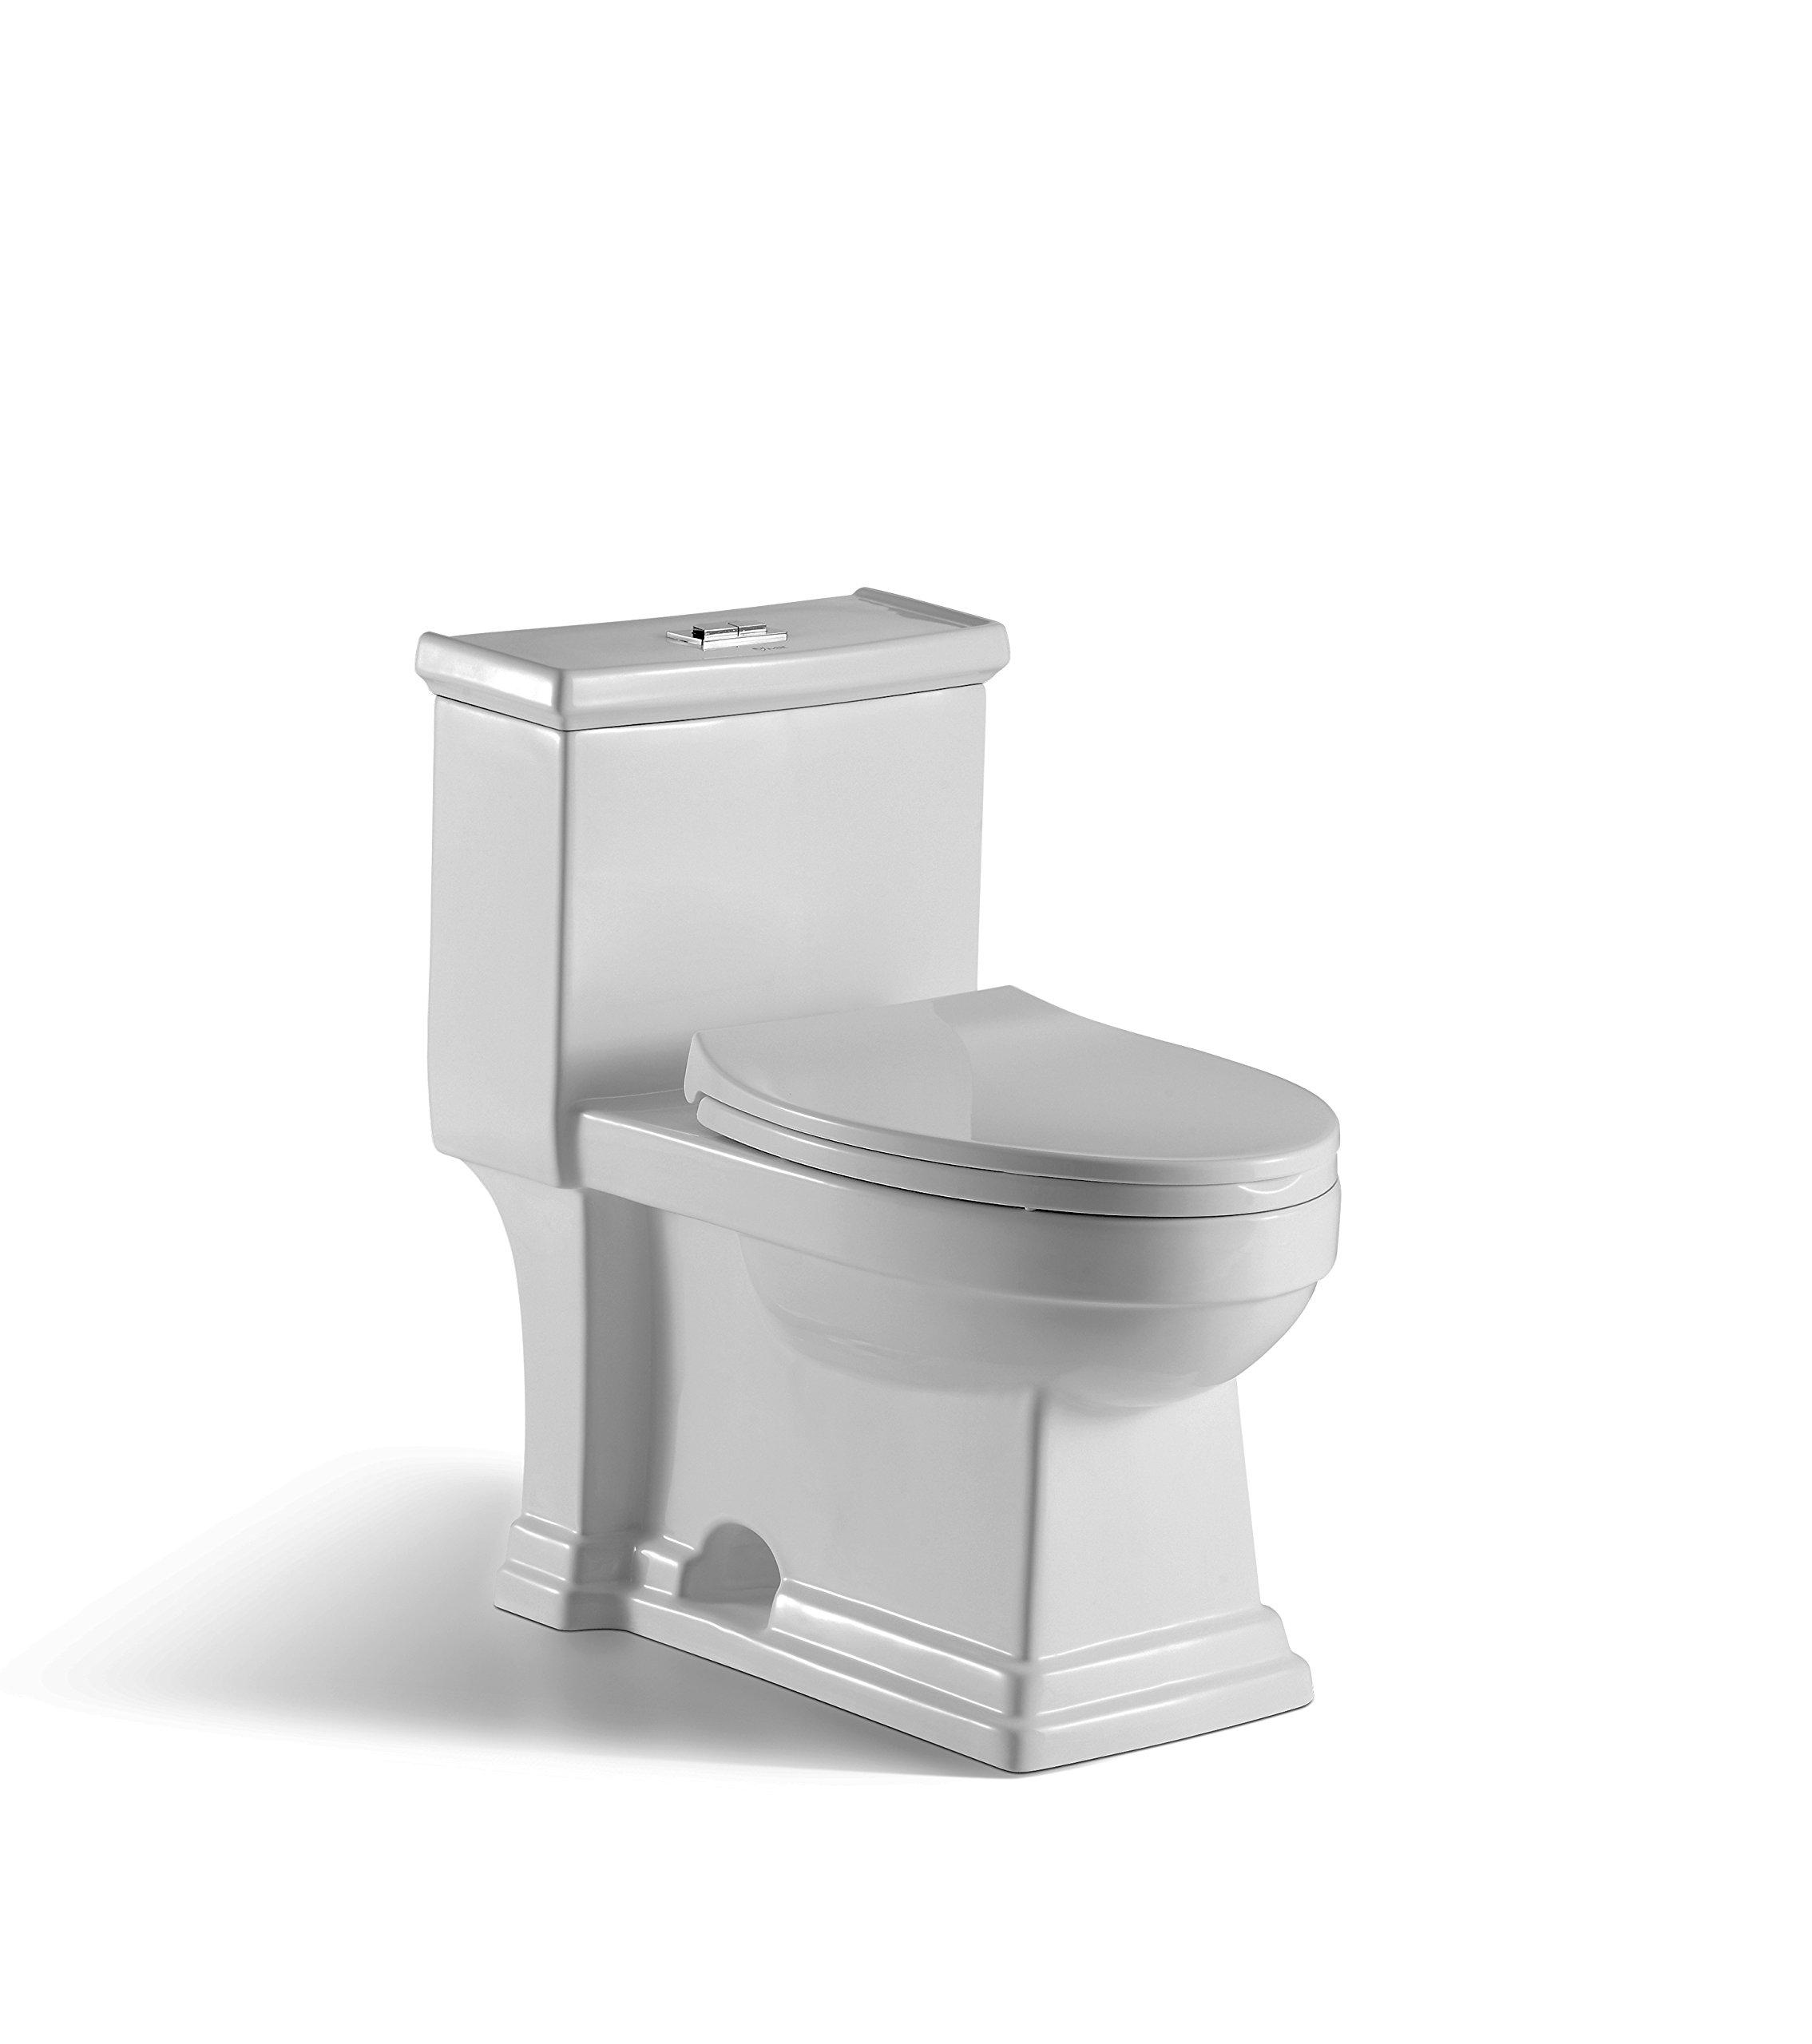 innoci-usa Block 1-piece 1.0 GPF/1.5 GPF High Efficiency Dual Flush Elongated Toilet in White